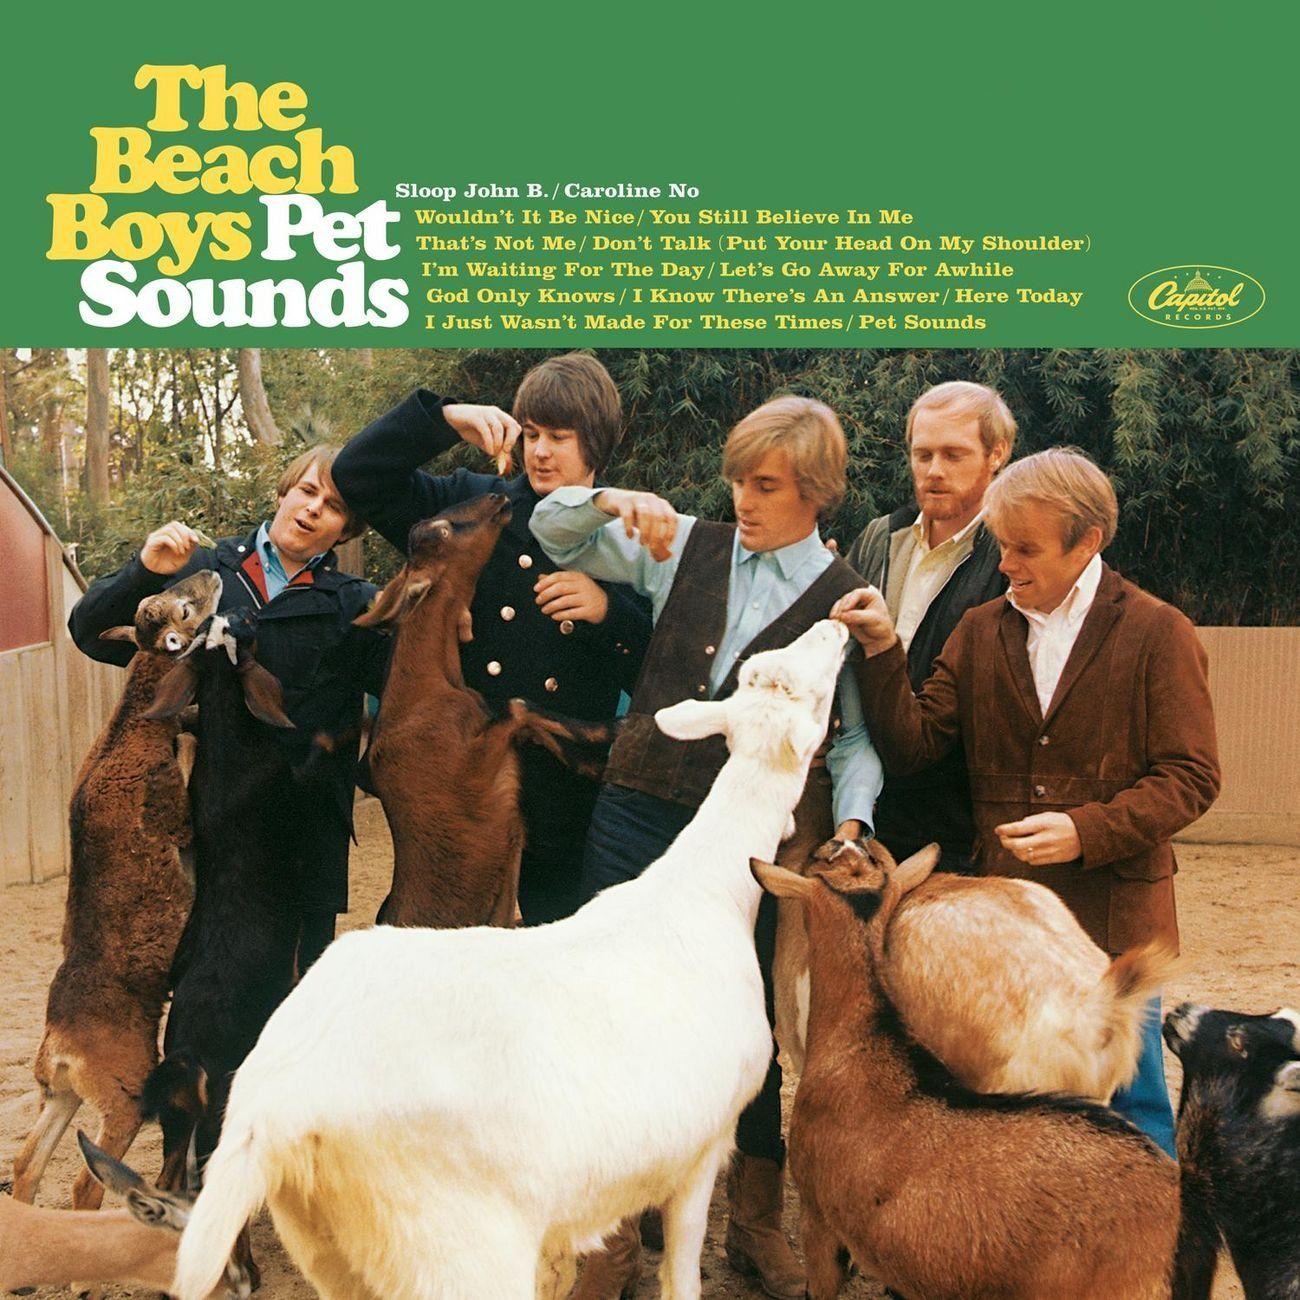 Beach Boys Pet Sounds